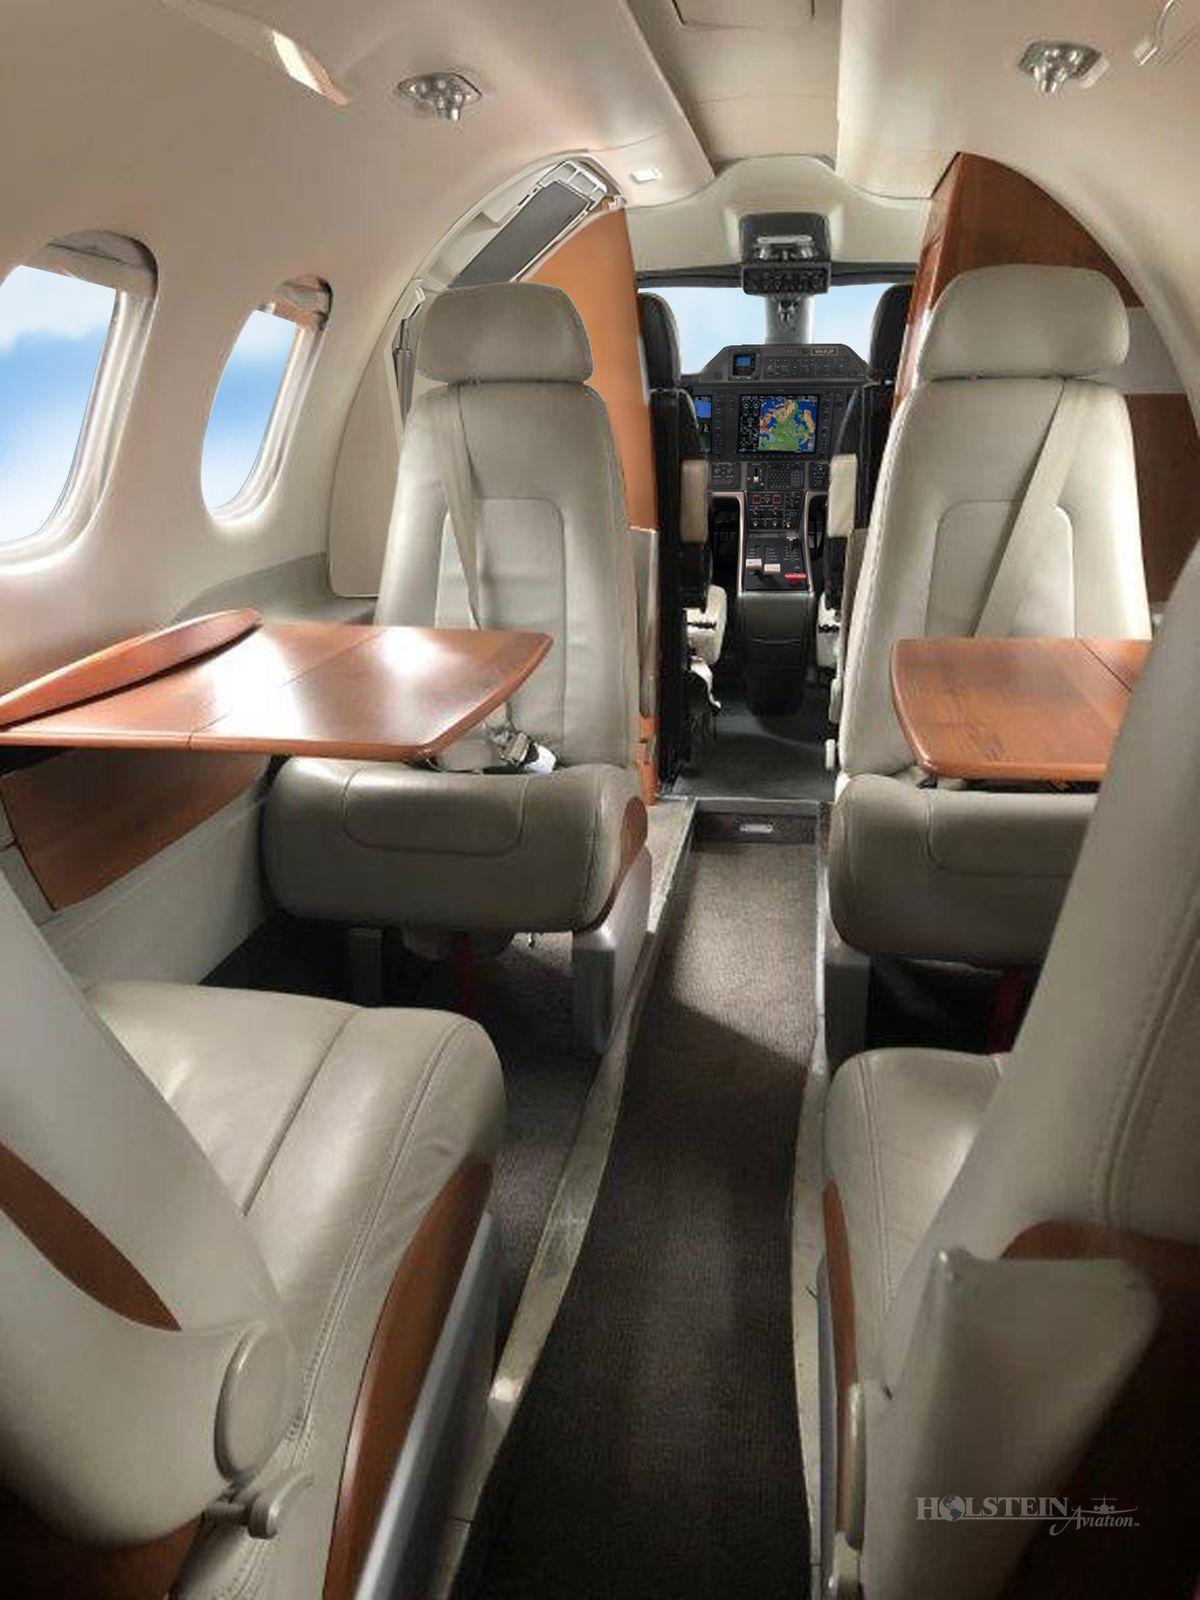 2011 Embraer Phenom 100 - SN 50000237 - VH-FJP - Int - Aft Fac Fwd - Tbl Ext RGB.jpg